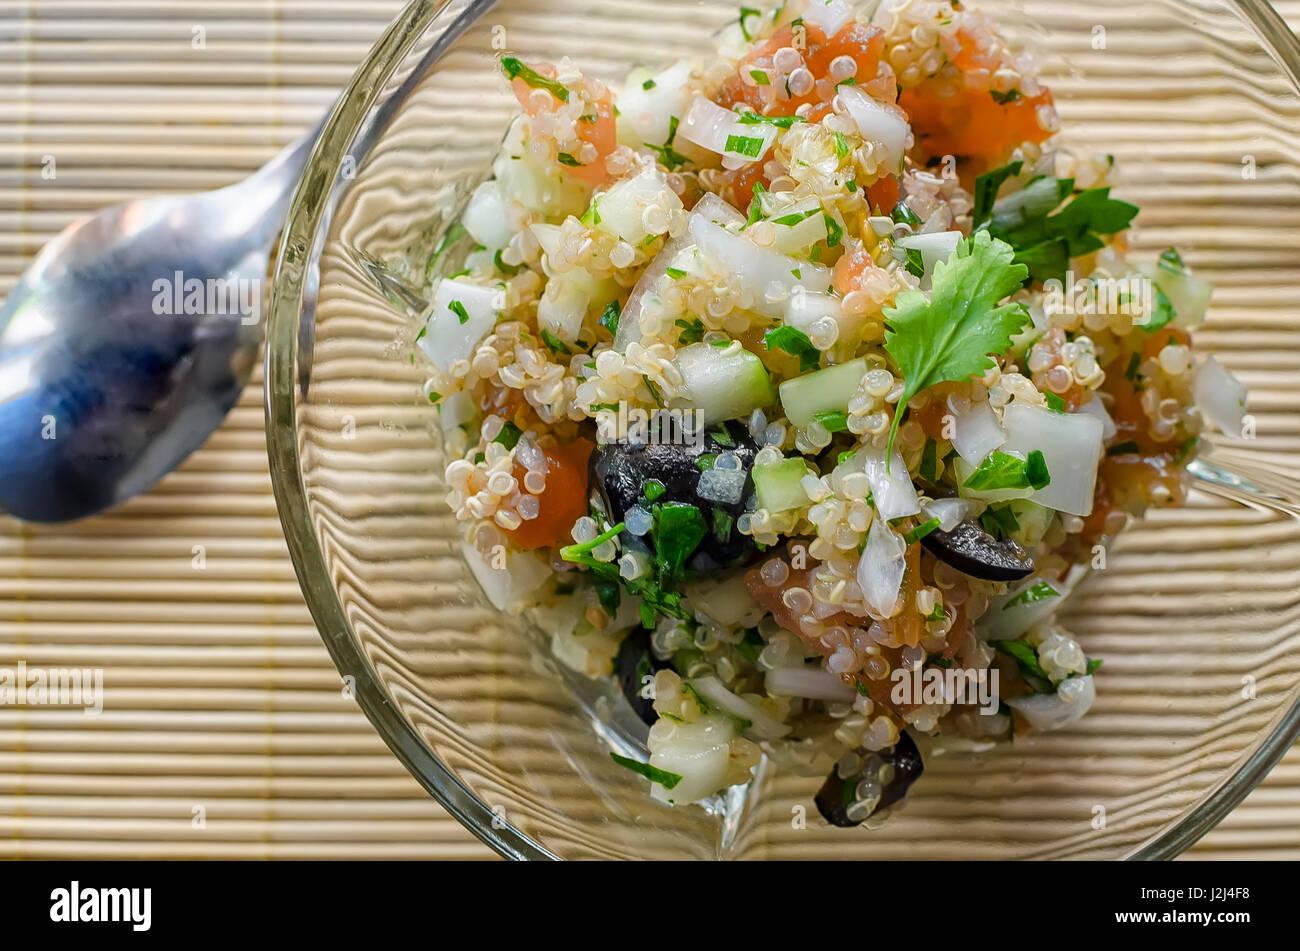 quinoa salad - Stock Image